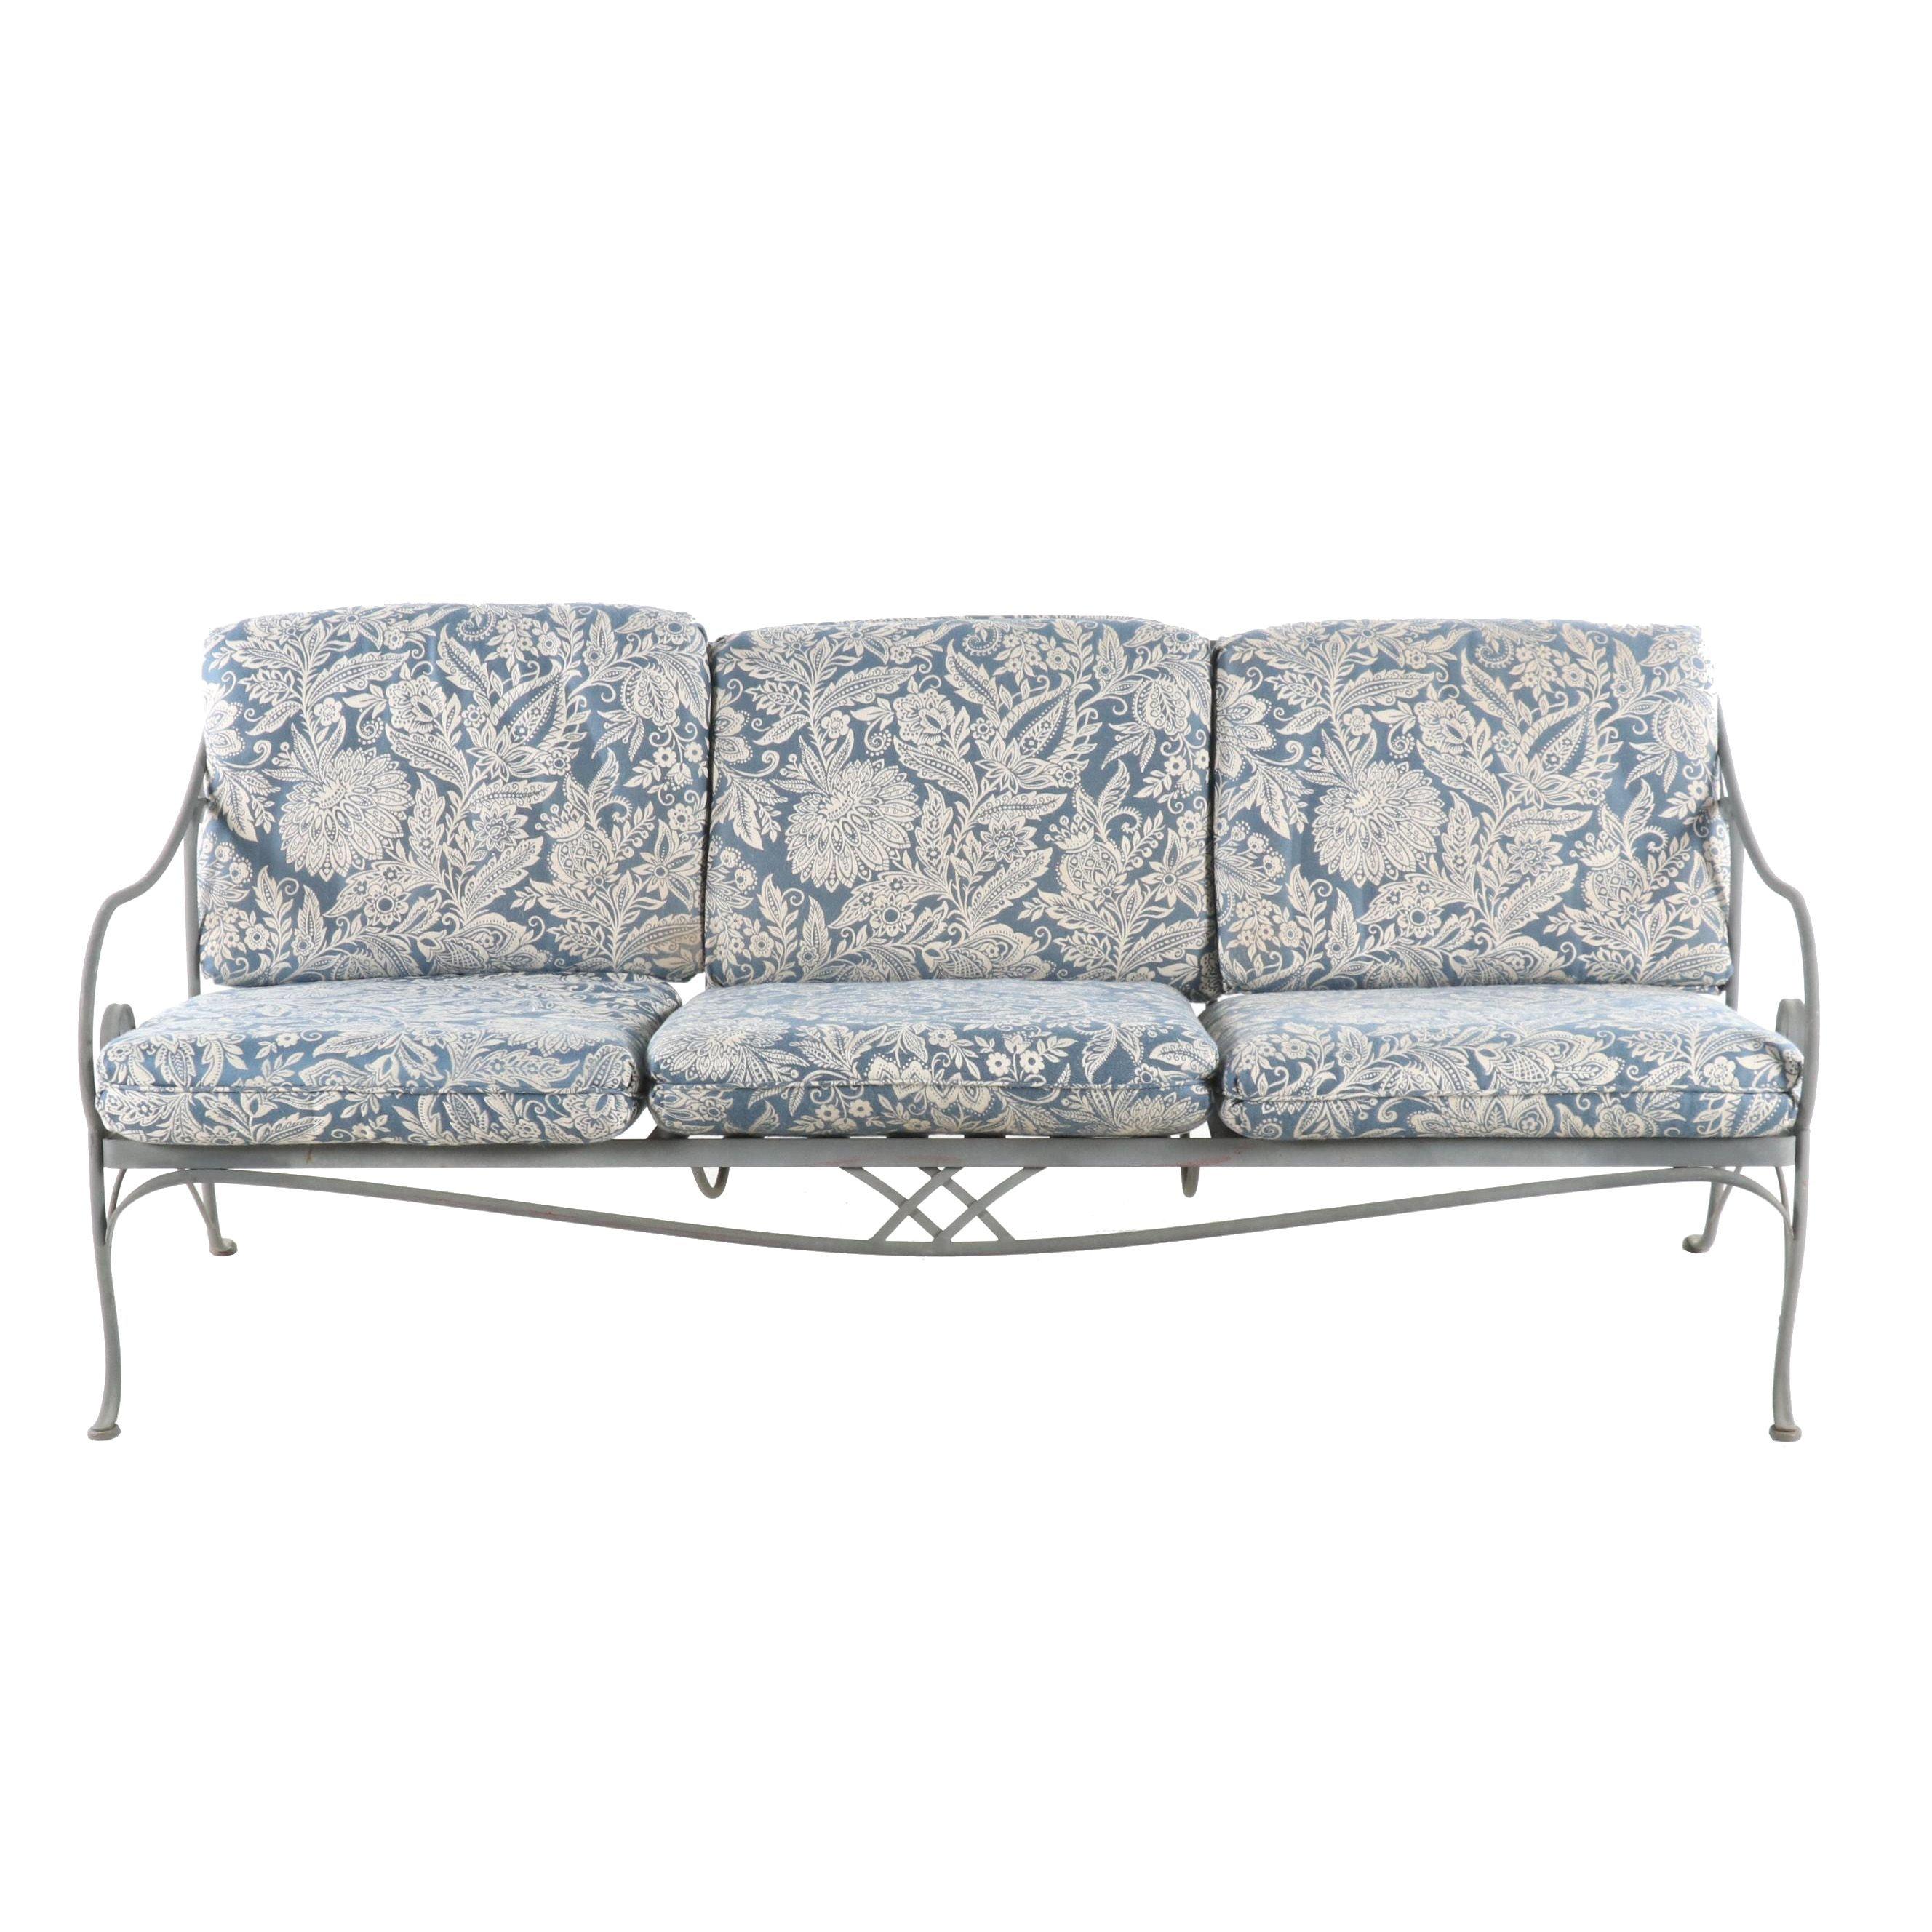 Metal Patio Sofa, Contemporary